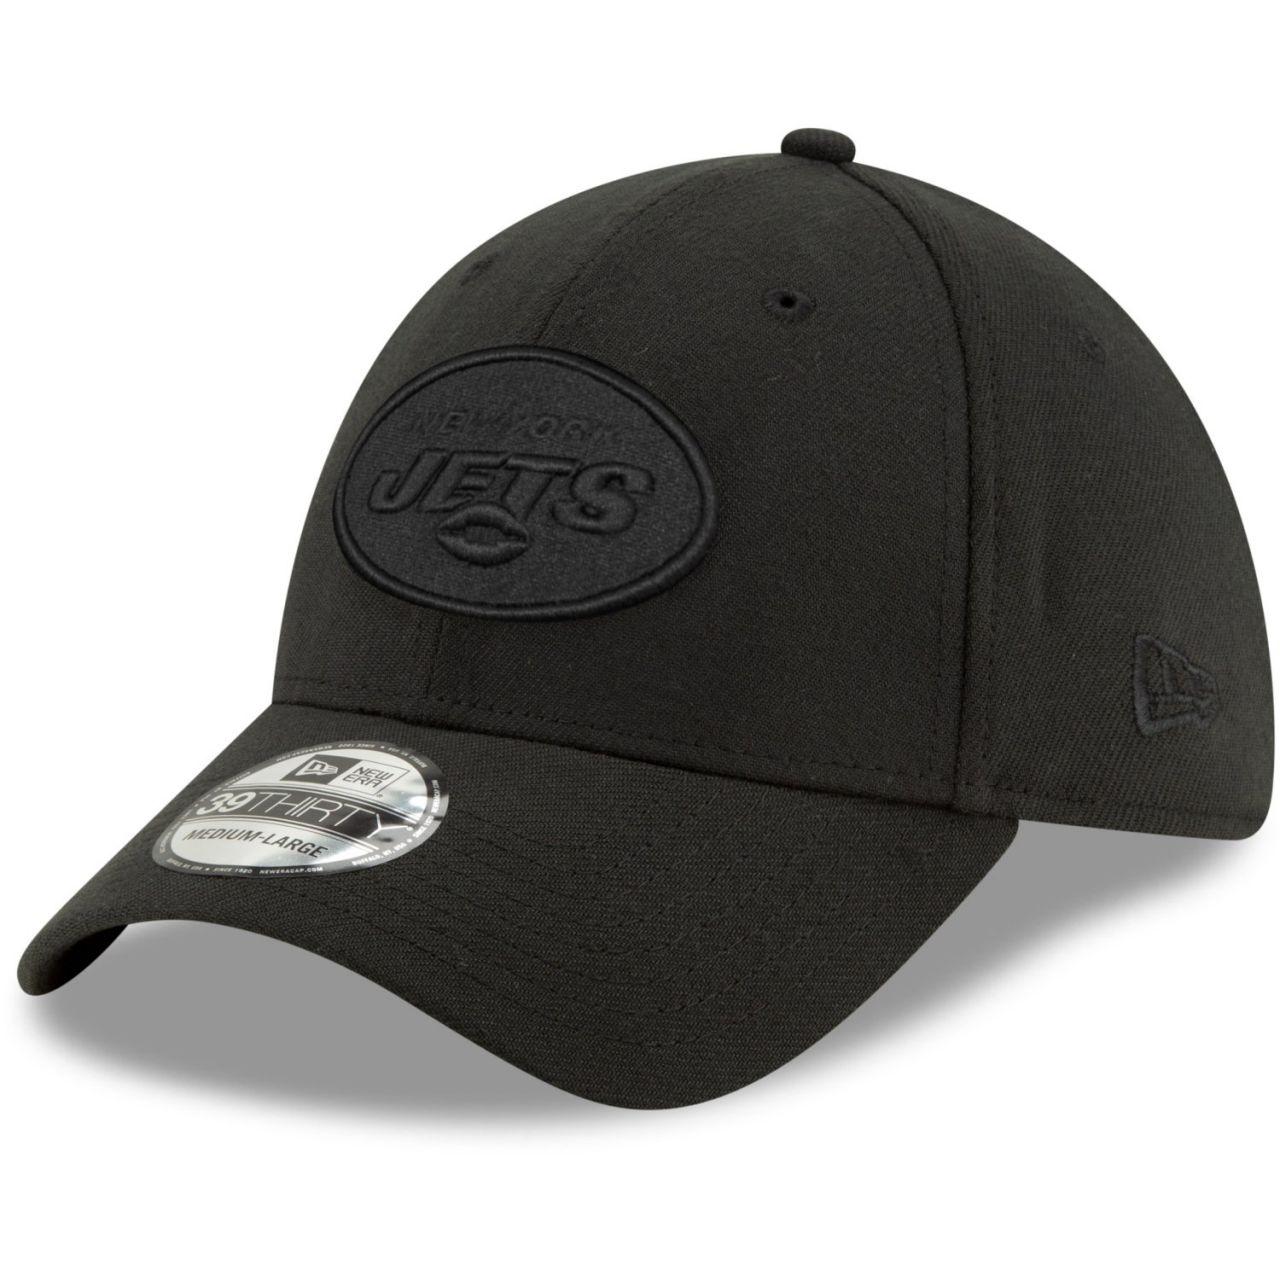 amfoo - New Era 39Thirty Stretch Cap - NFL New York Jets